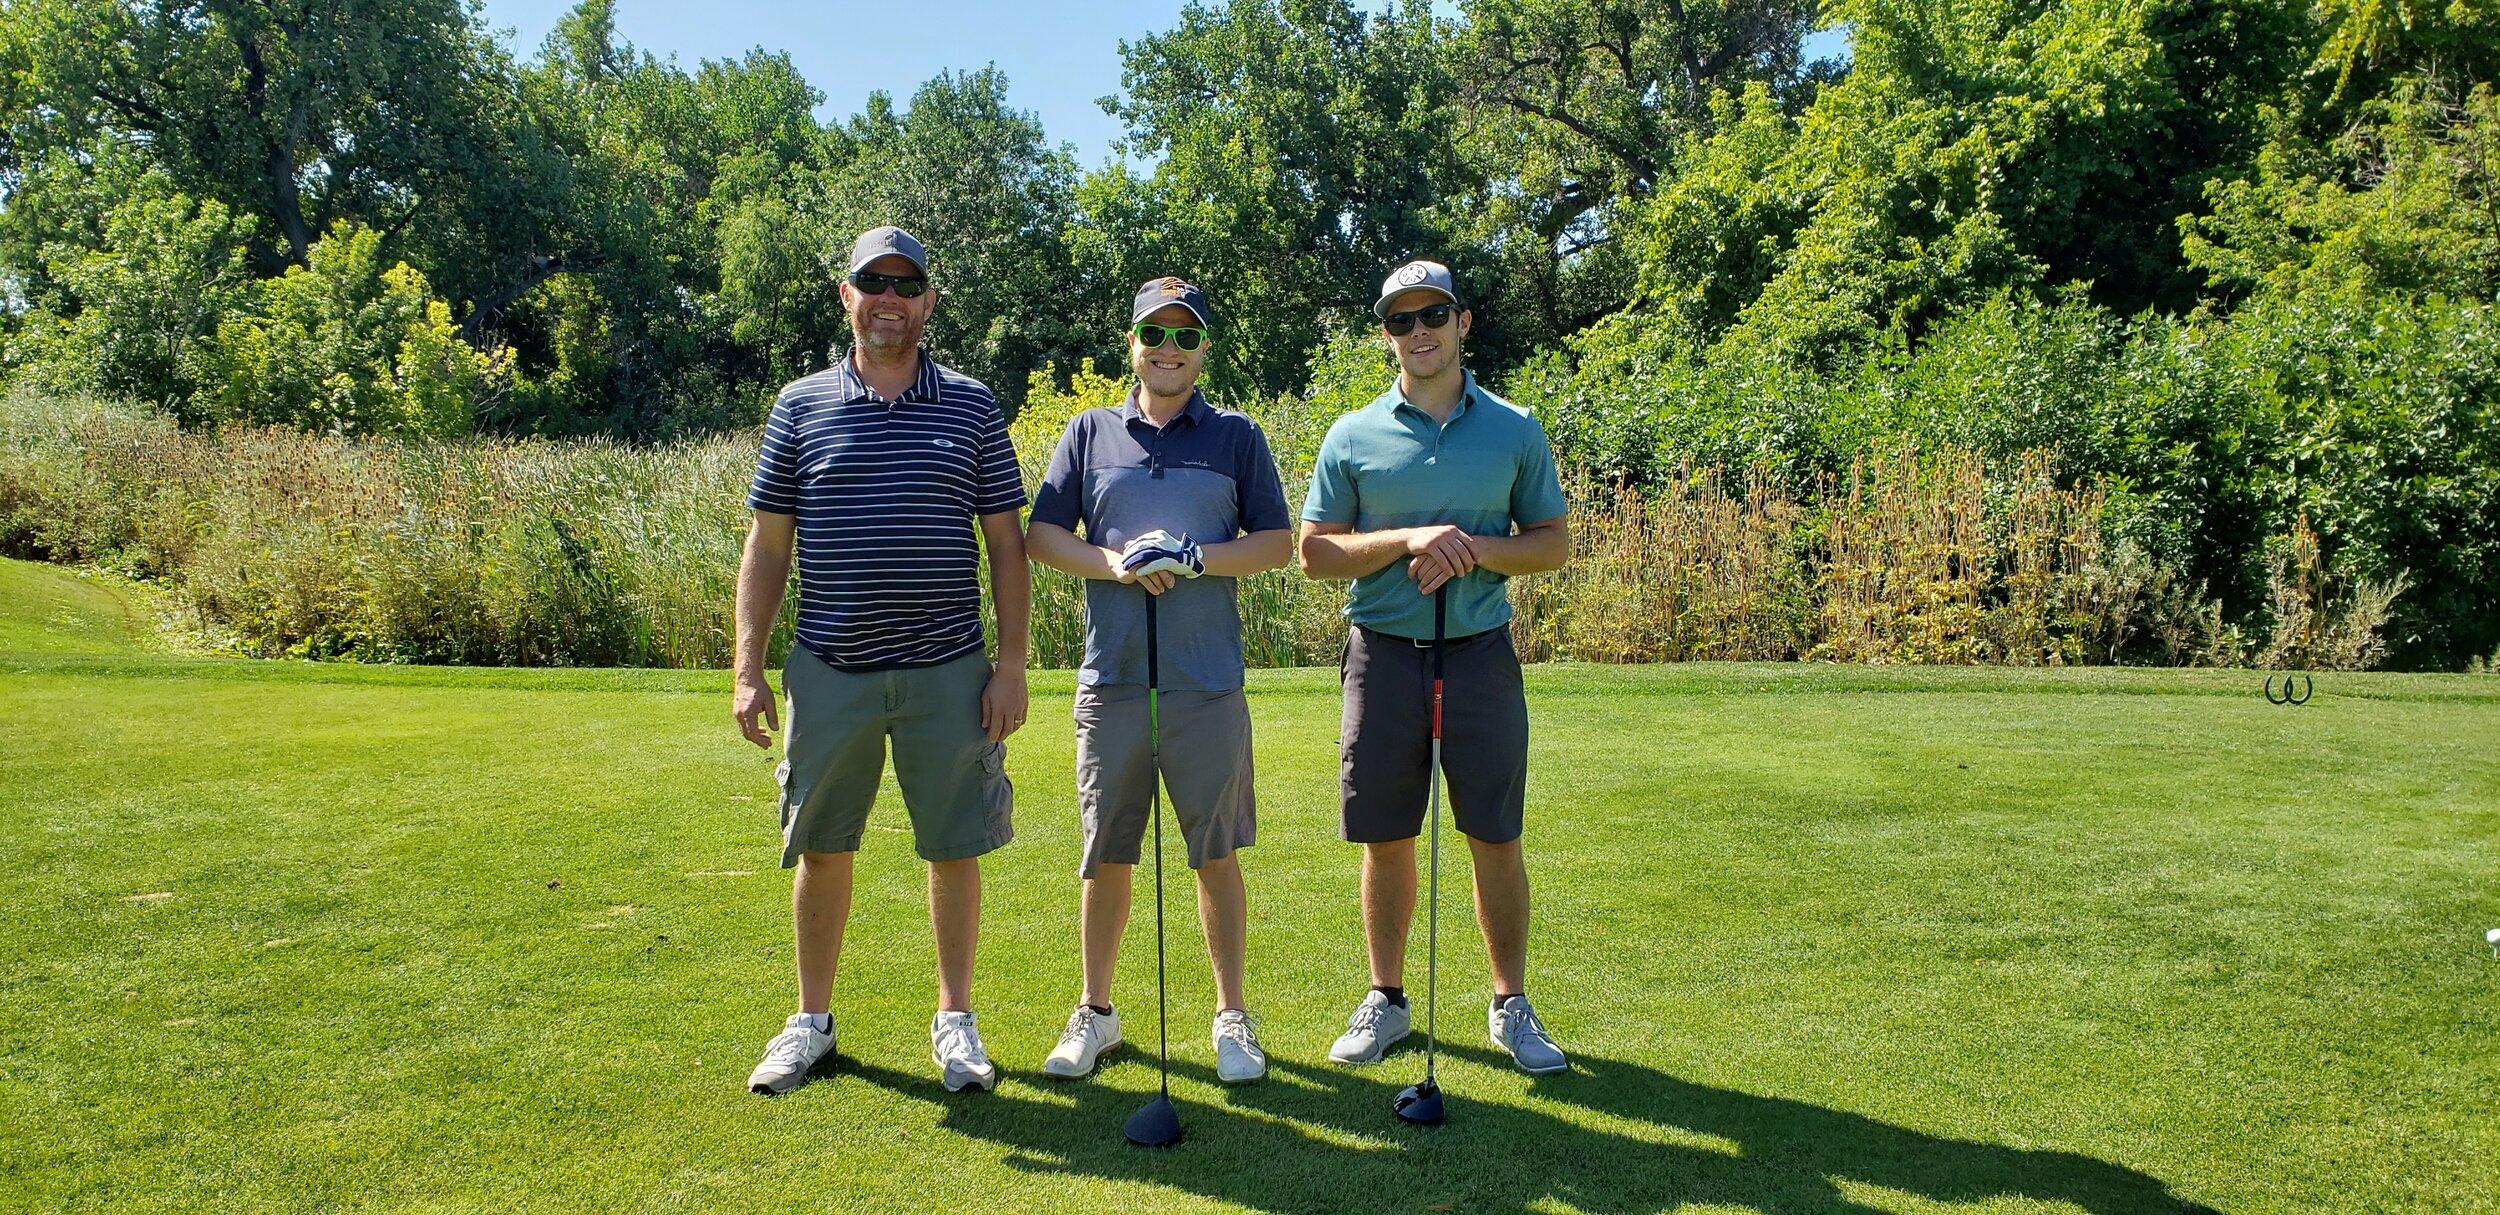 Scott McClain  Adolfson & Peterson Construction,  Kevin Bene  R&R Engineers-Surveyors, Inc.,  Kyle Donahue  Haselden Construction